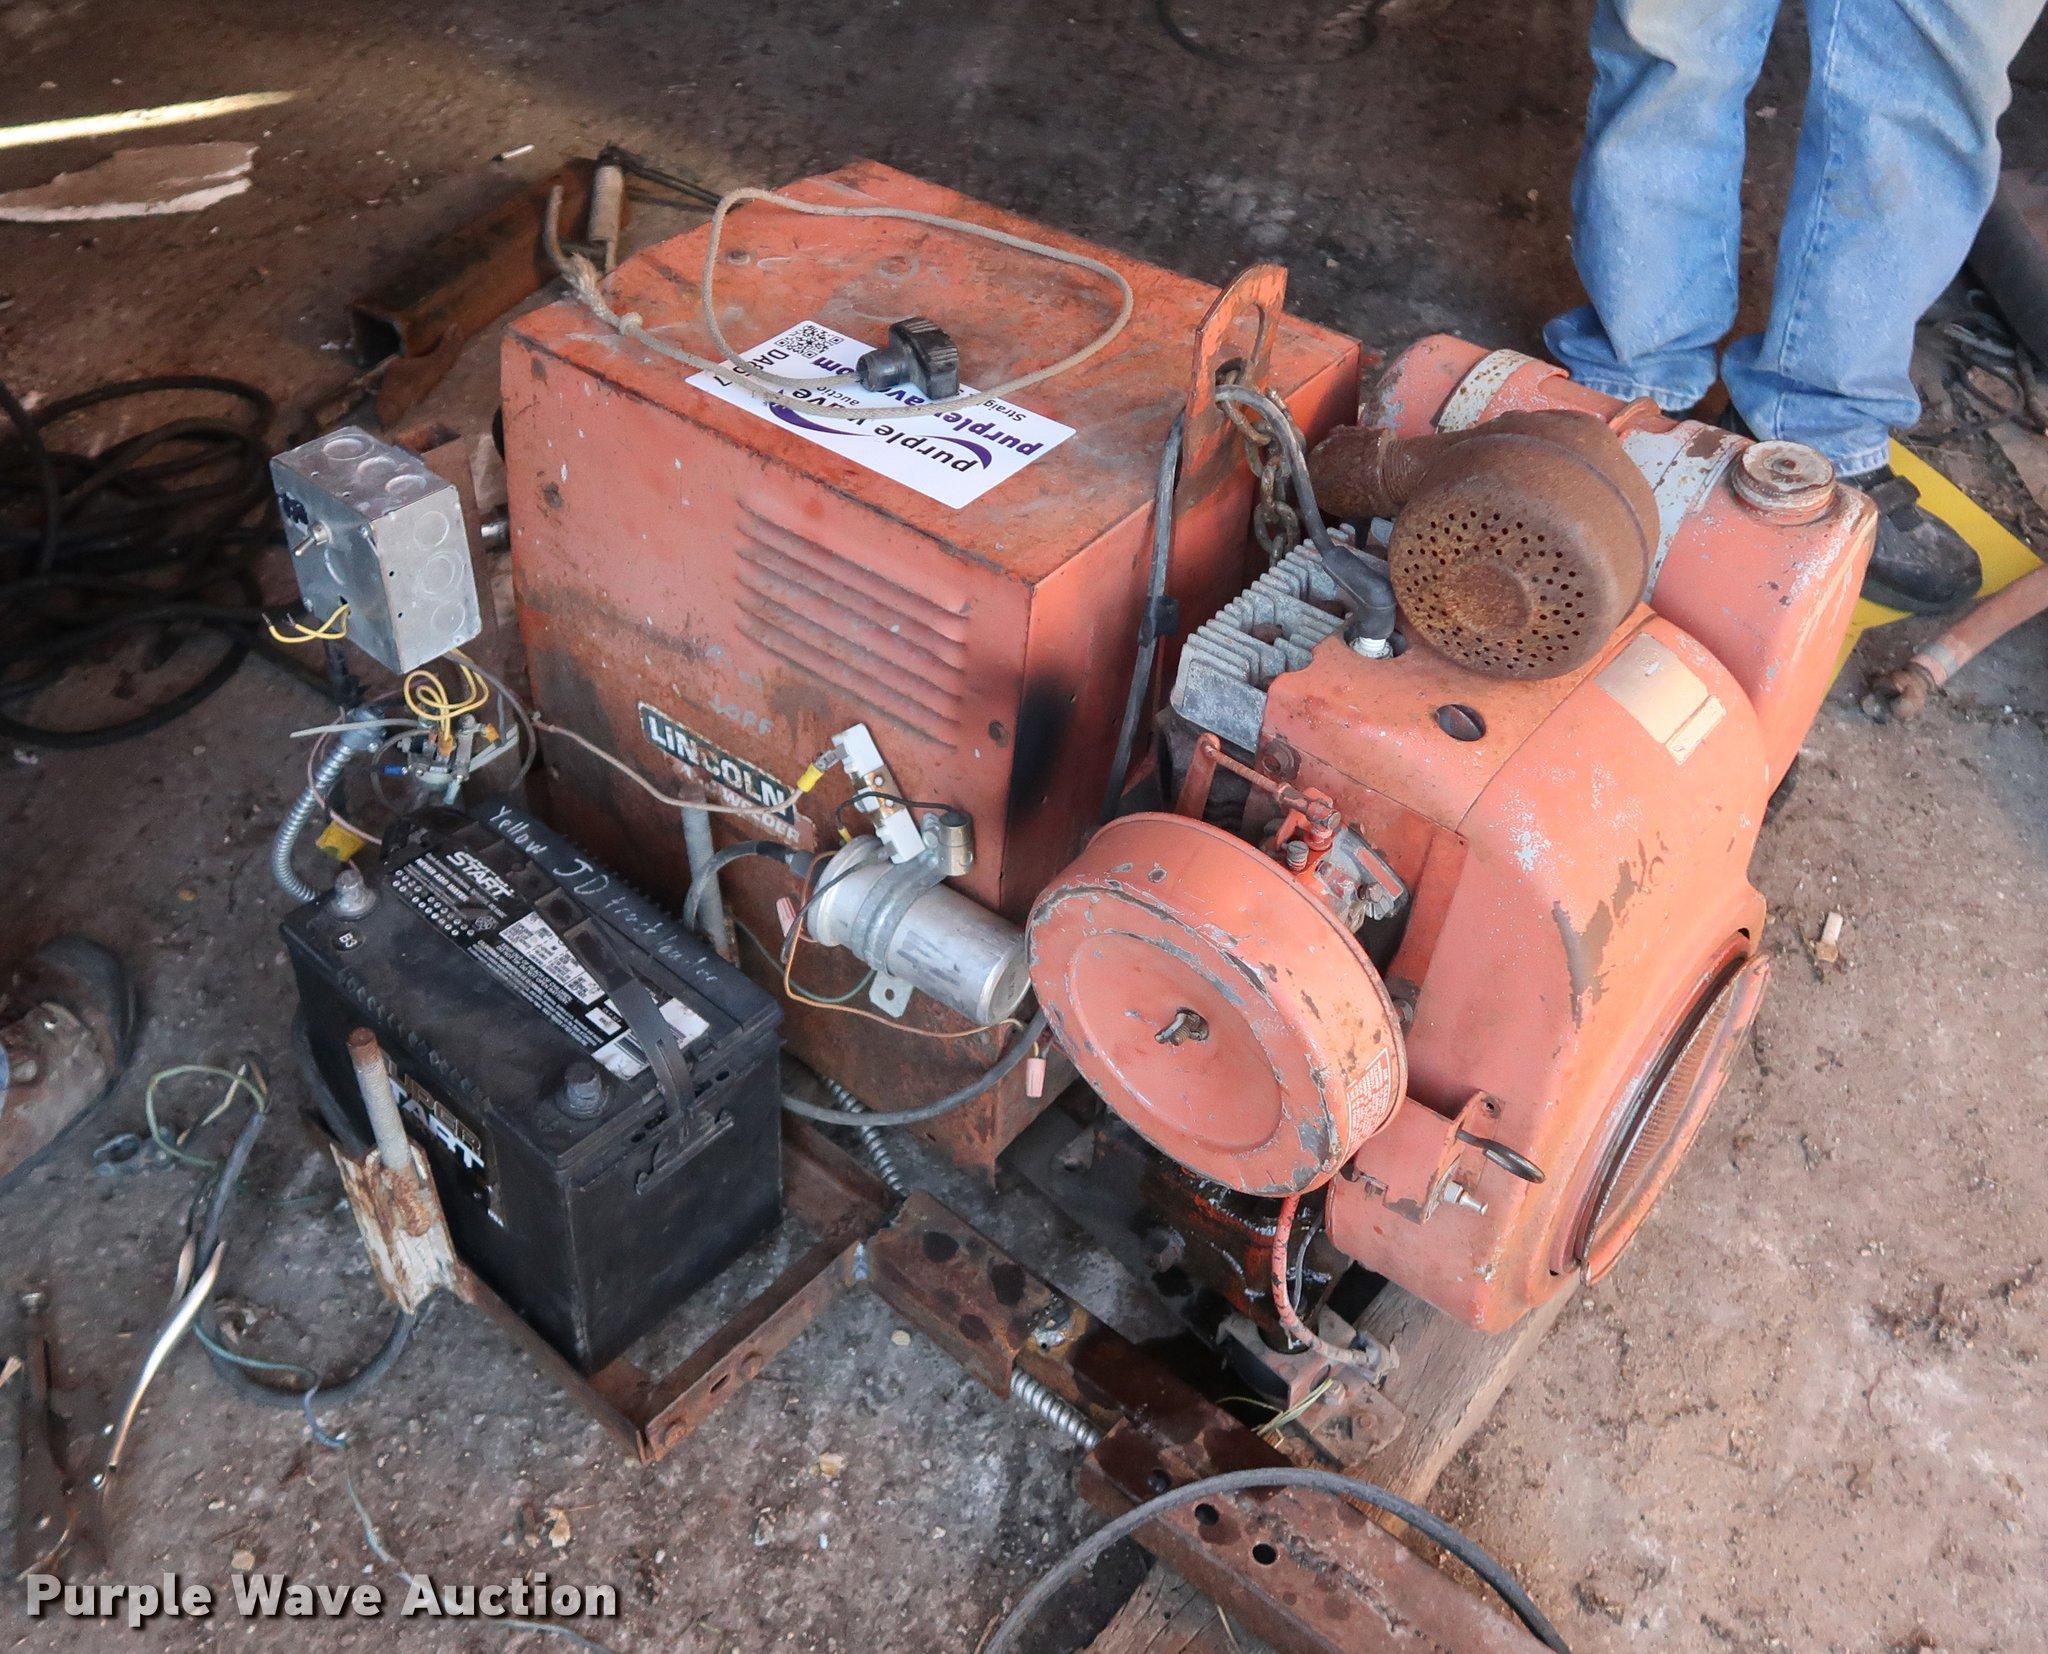 Lincoln Electric Weldan Power 150 welder/generator | Item DA